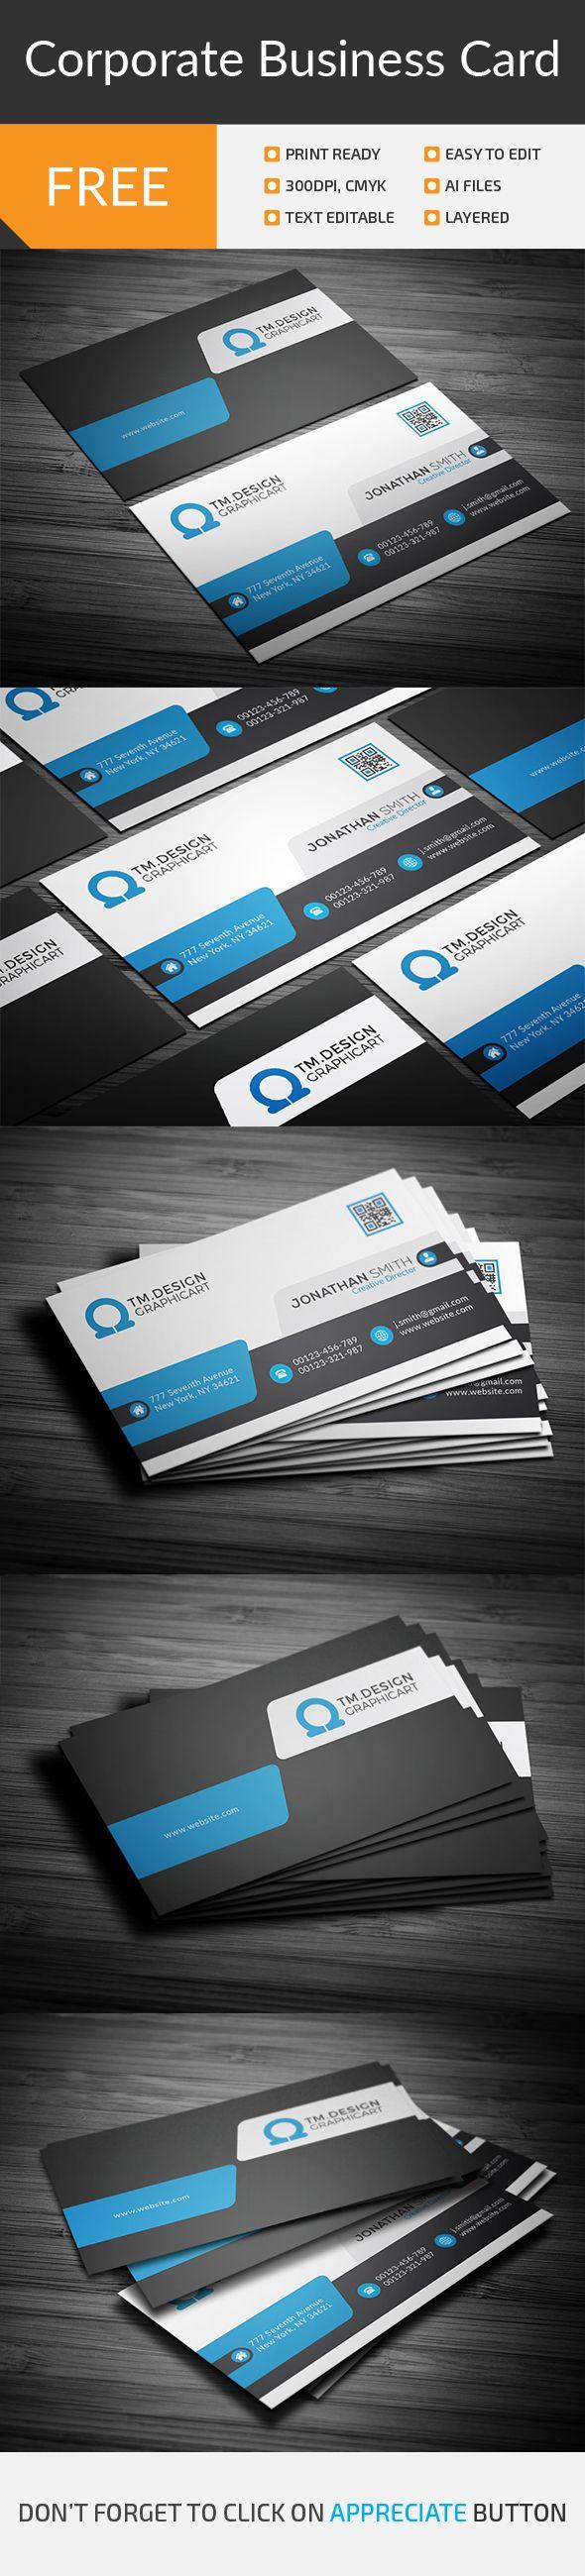 7 best business card images on pinterest fonts business cards corporate business business cards fonts visit cards name cards writing fonts script fonts magicingreecefo Choice Image